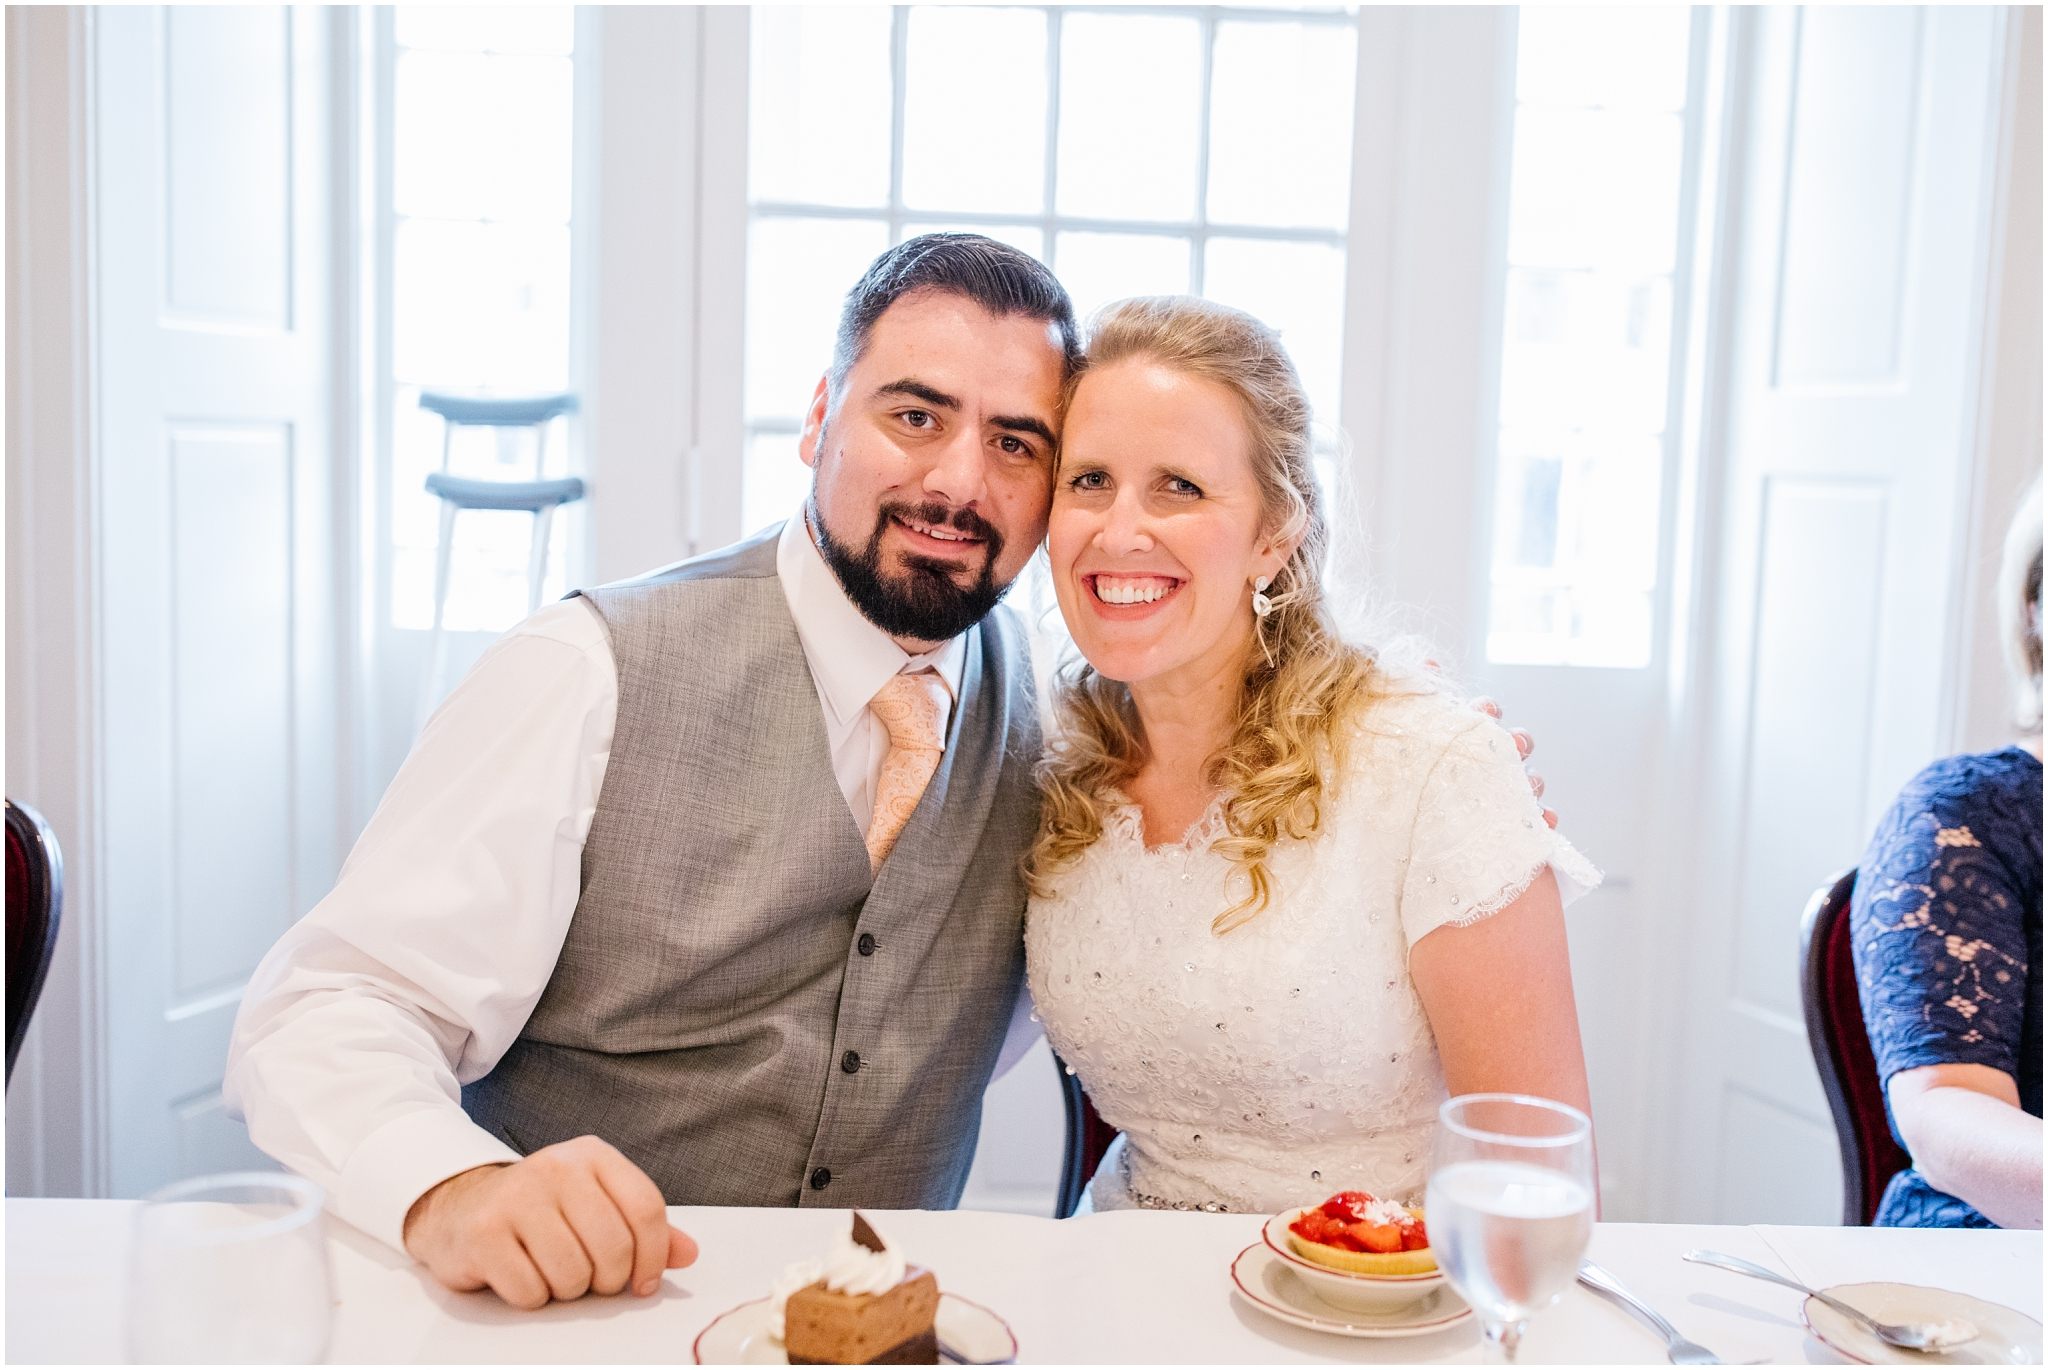 Justin and Melissa-230_Lizzie-B-Imagery-Utah-Wedding-Photographer-Salt-Lake-City-Temple-The-Grand-Ballroom.jpg